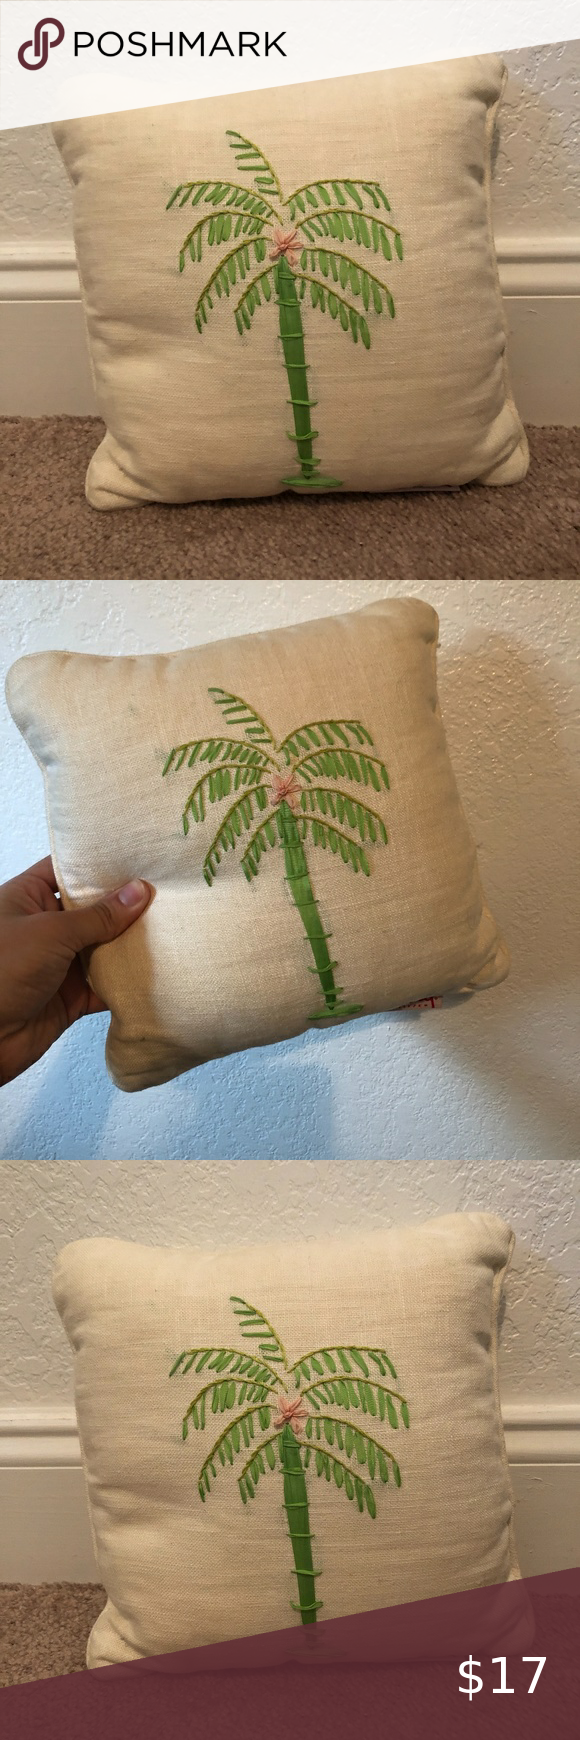 10x10 Girls Bedroom: Lilly Pulitzer Mini Palm Tree Decor Pillow 10x10 In 2020